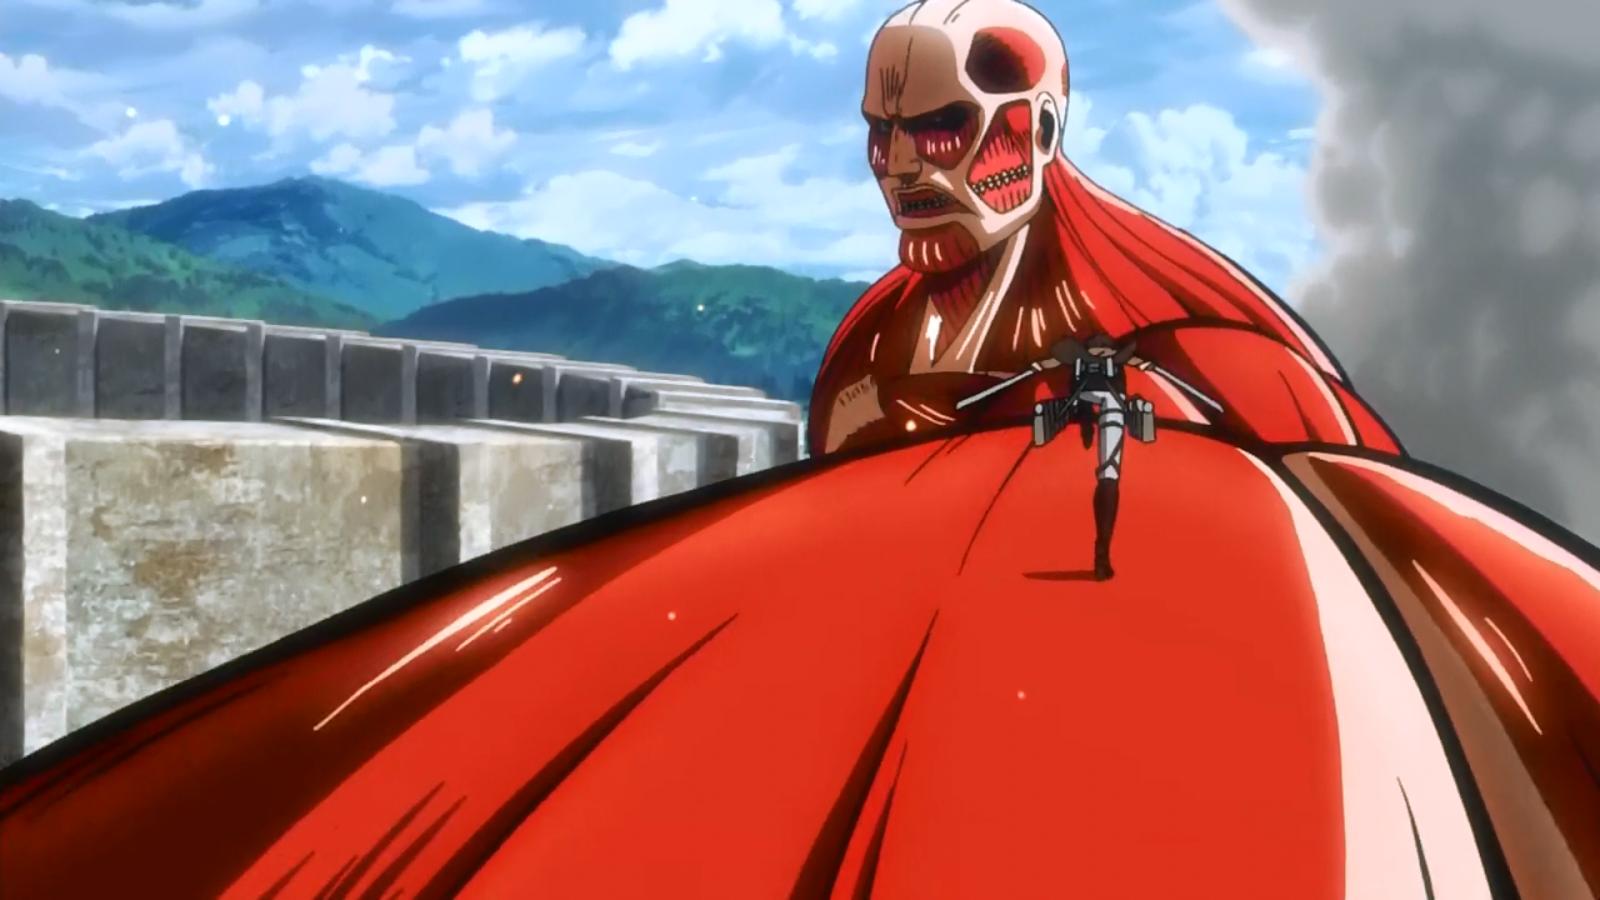 Leftovers of my aot batch. Review zum fantastischen Attack on Titan Anime - http ...